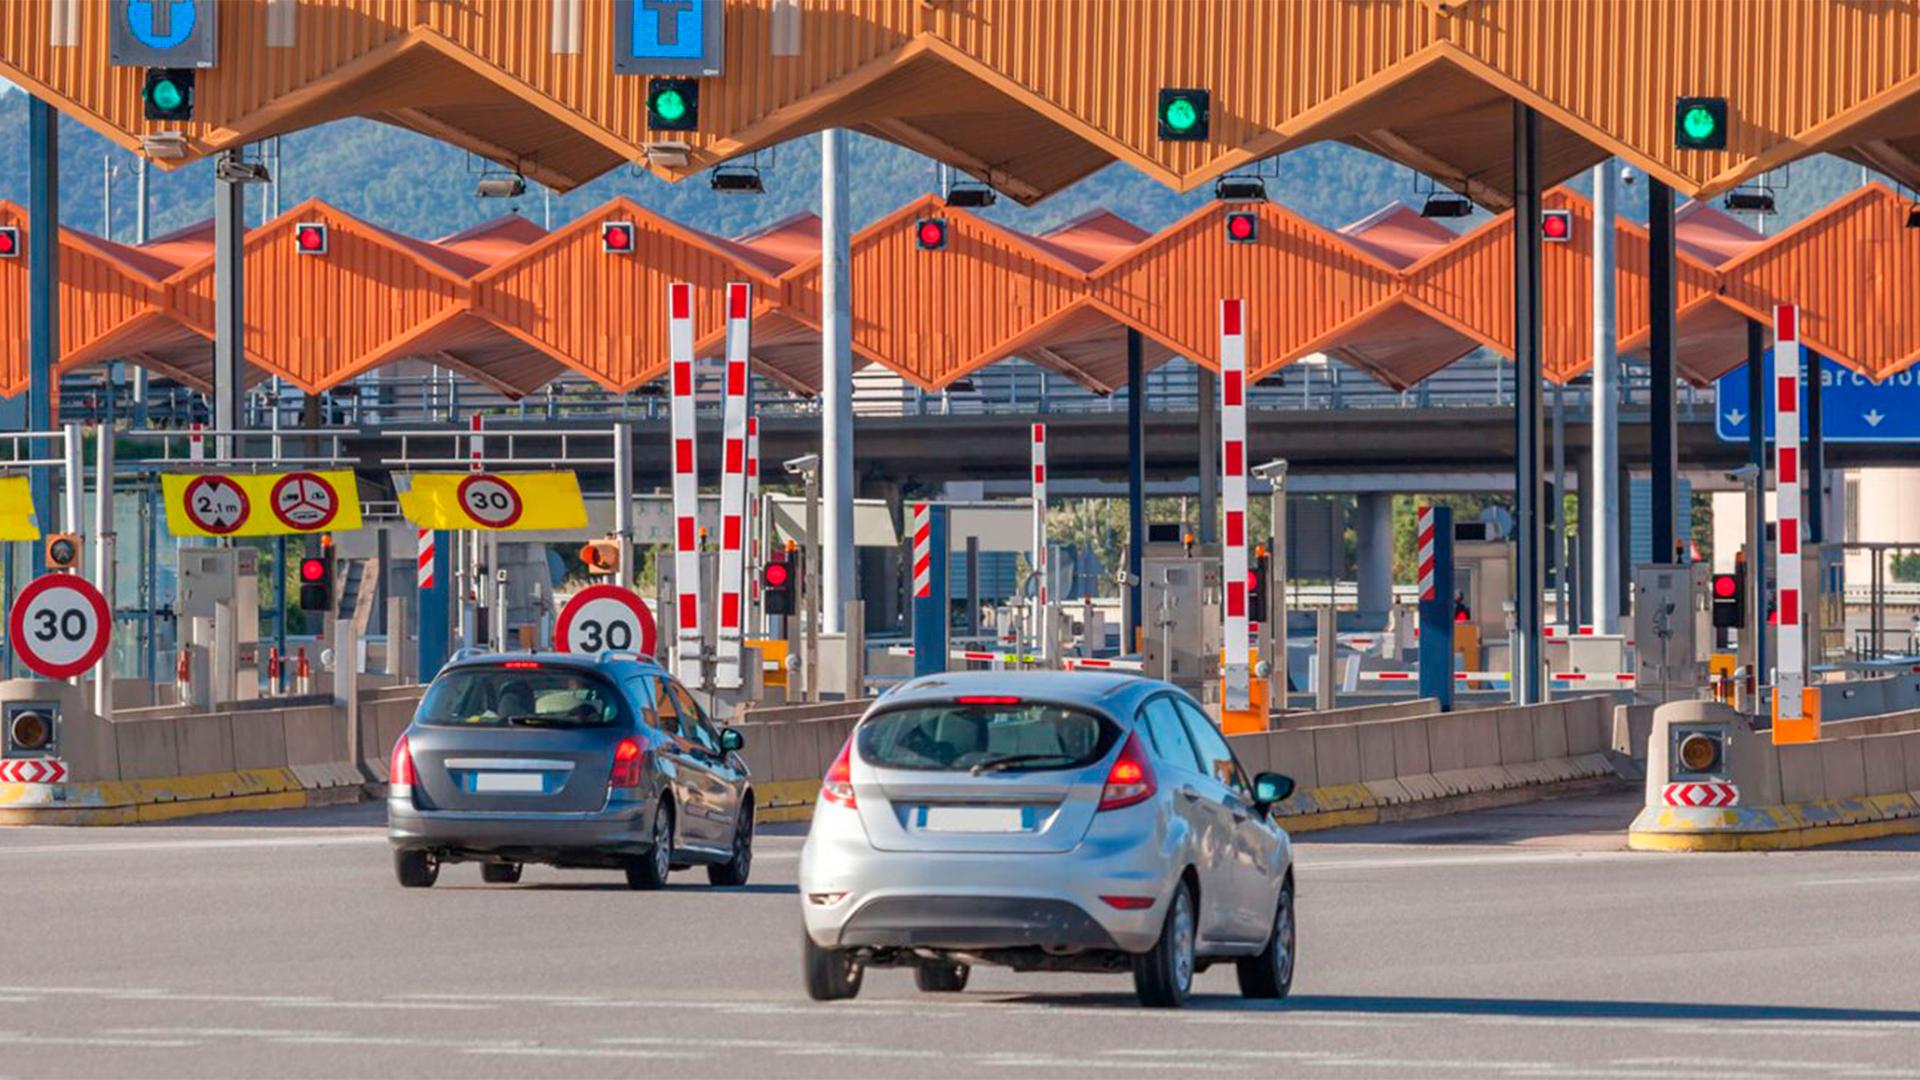 A partir del mes de septiembre, estas autopistas de peaje pasarán a ser gratuitas